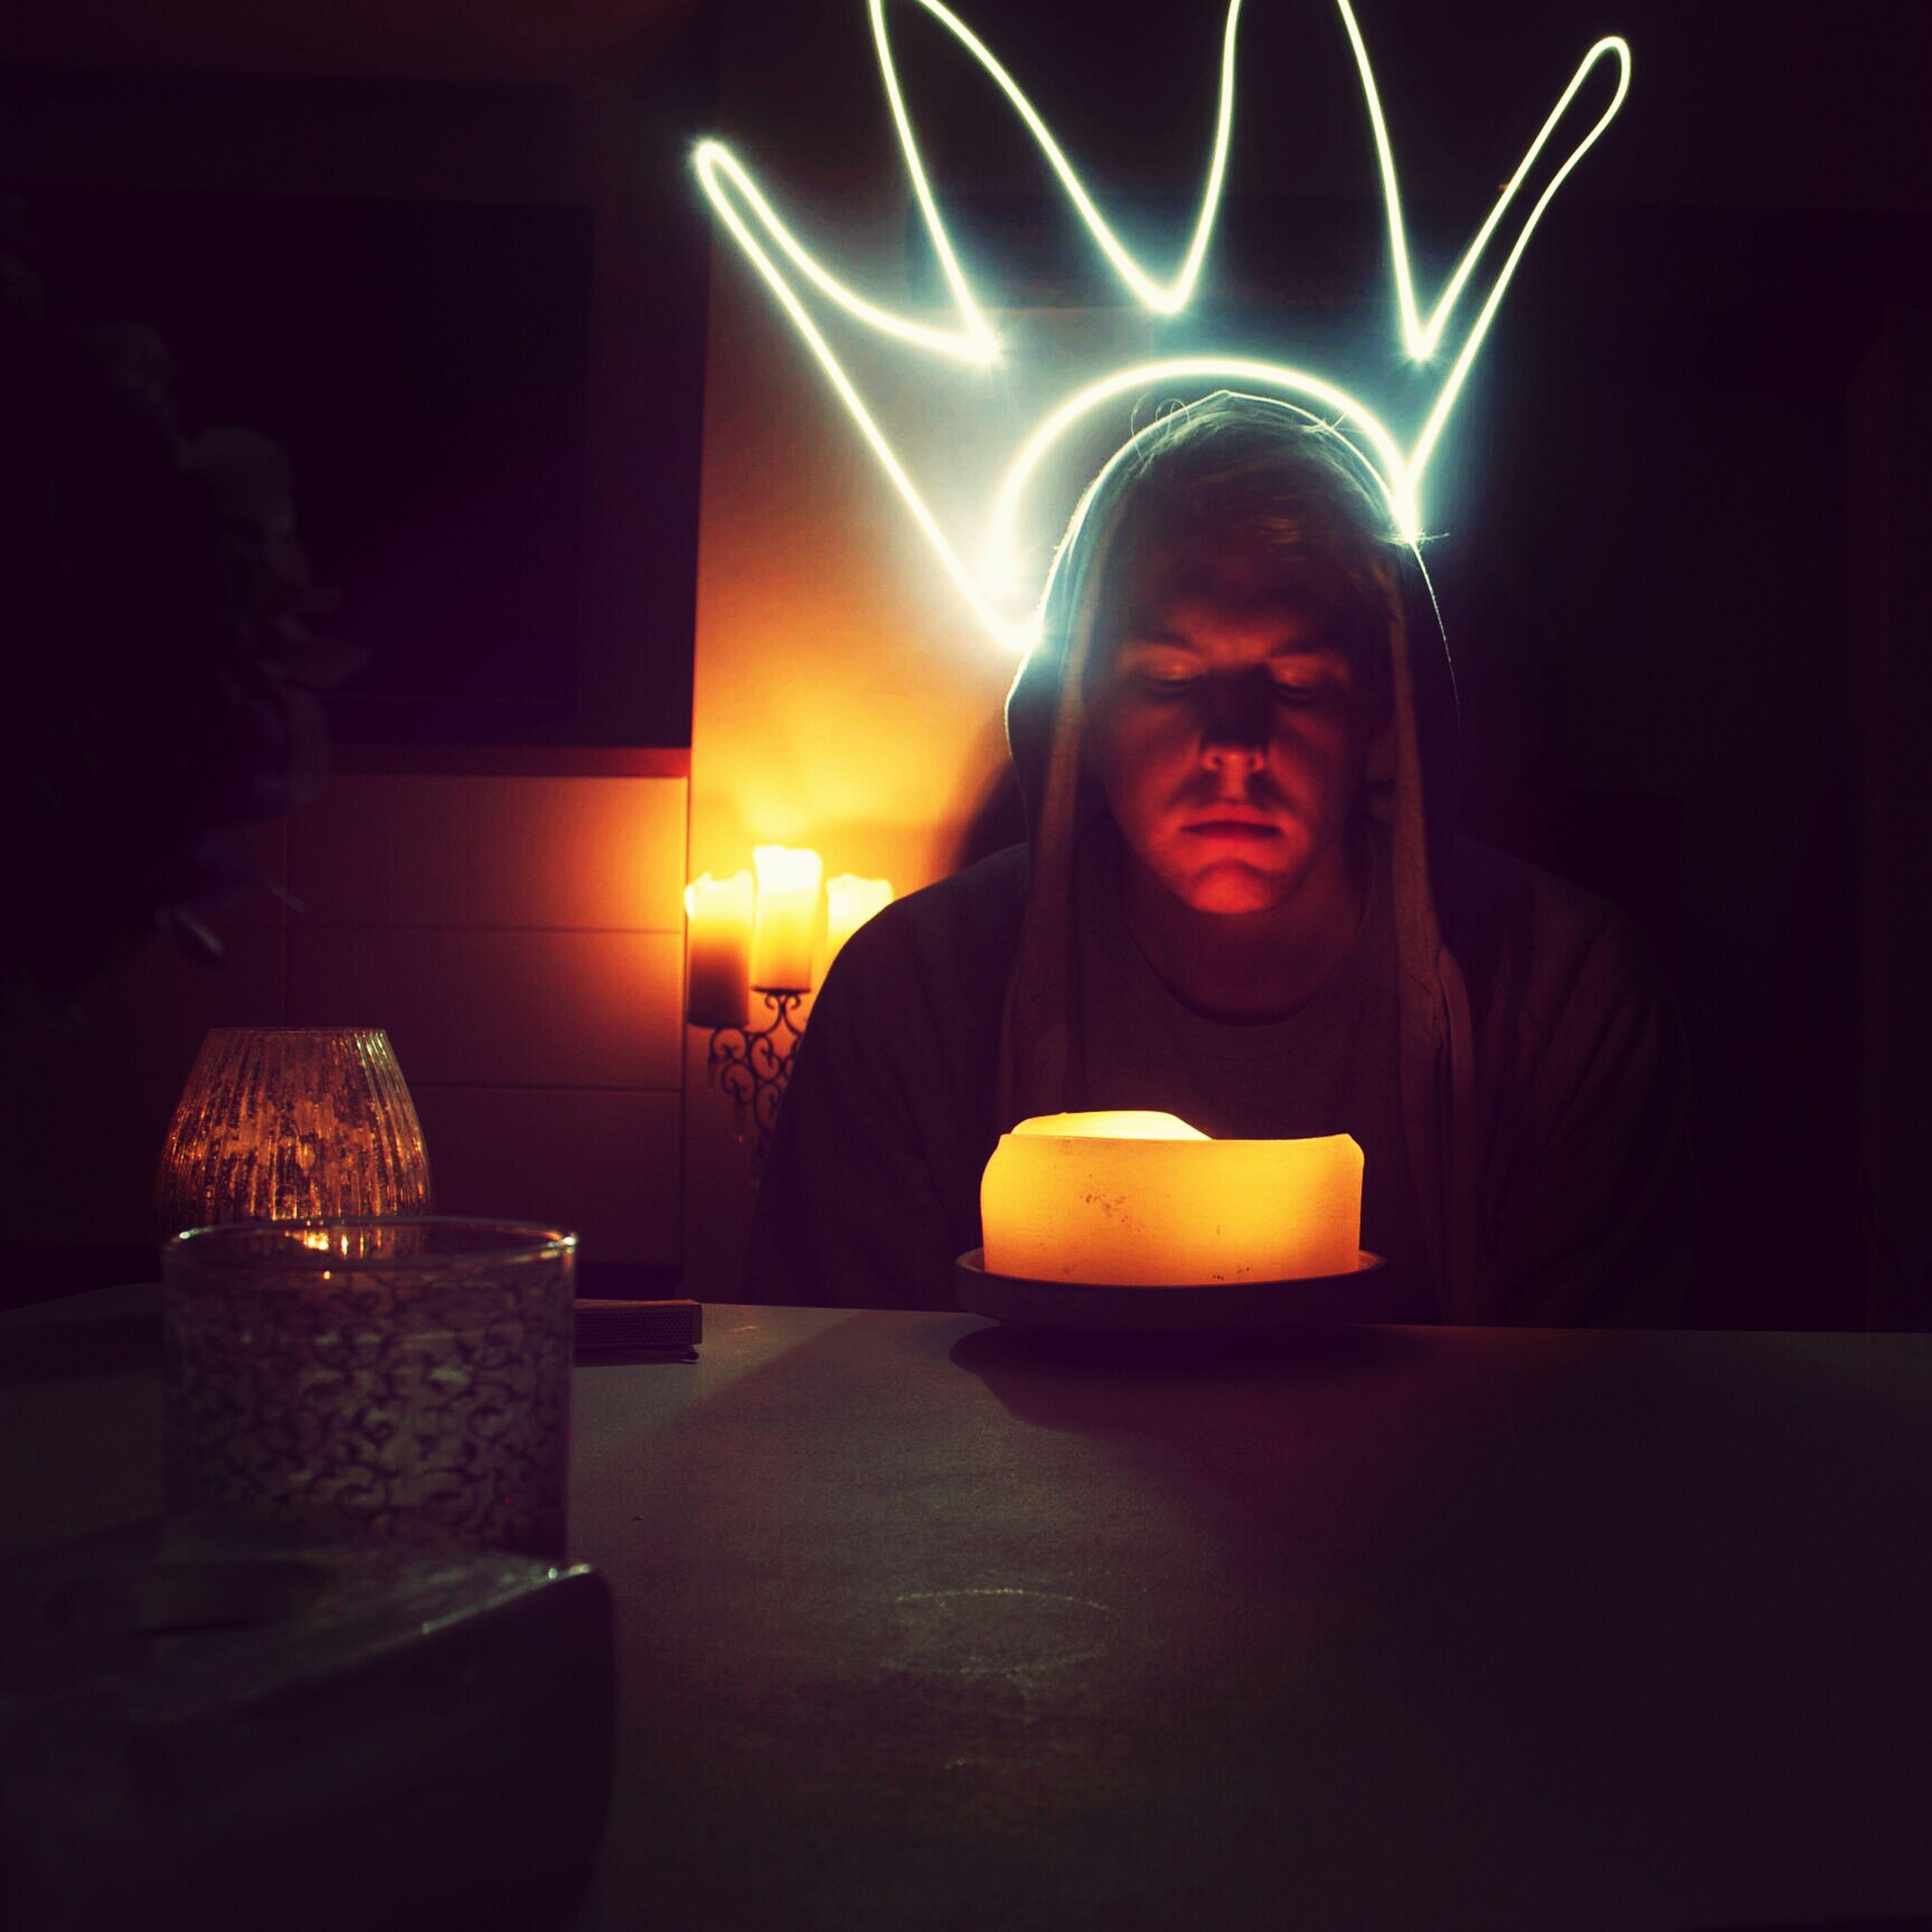 illuminated, night, indoors, glowing, lifestyles, leisure activity, burning, flame, sitting, orange color, candle, fire - natural phenomenon, dark, lighting equipment, celebration, togetherness, standing